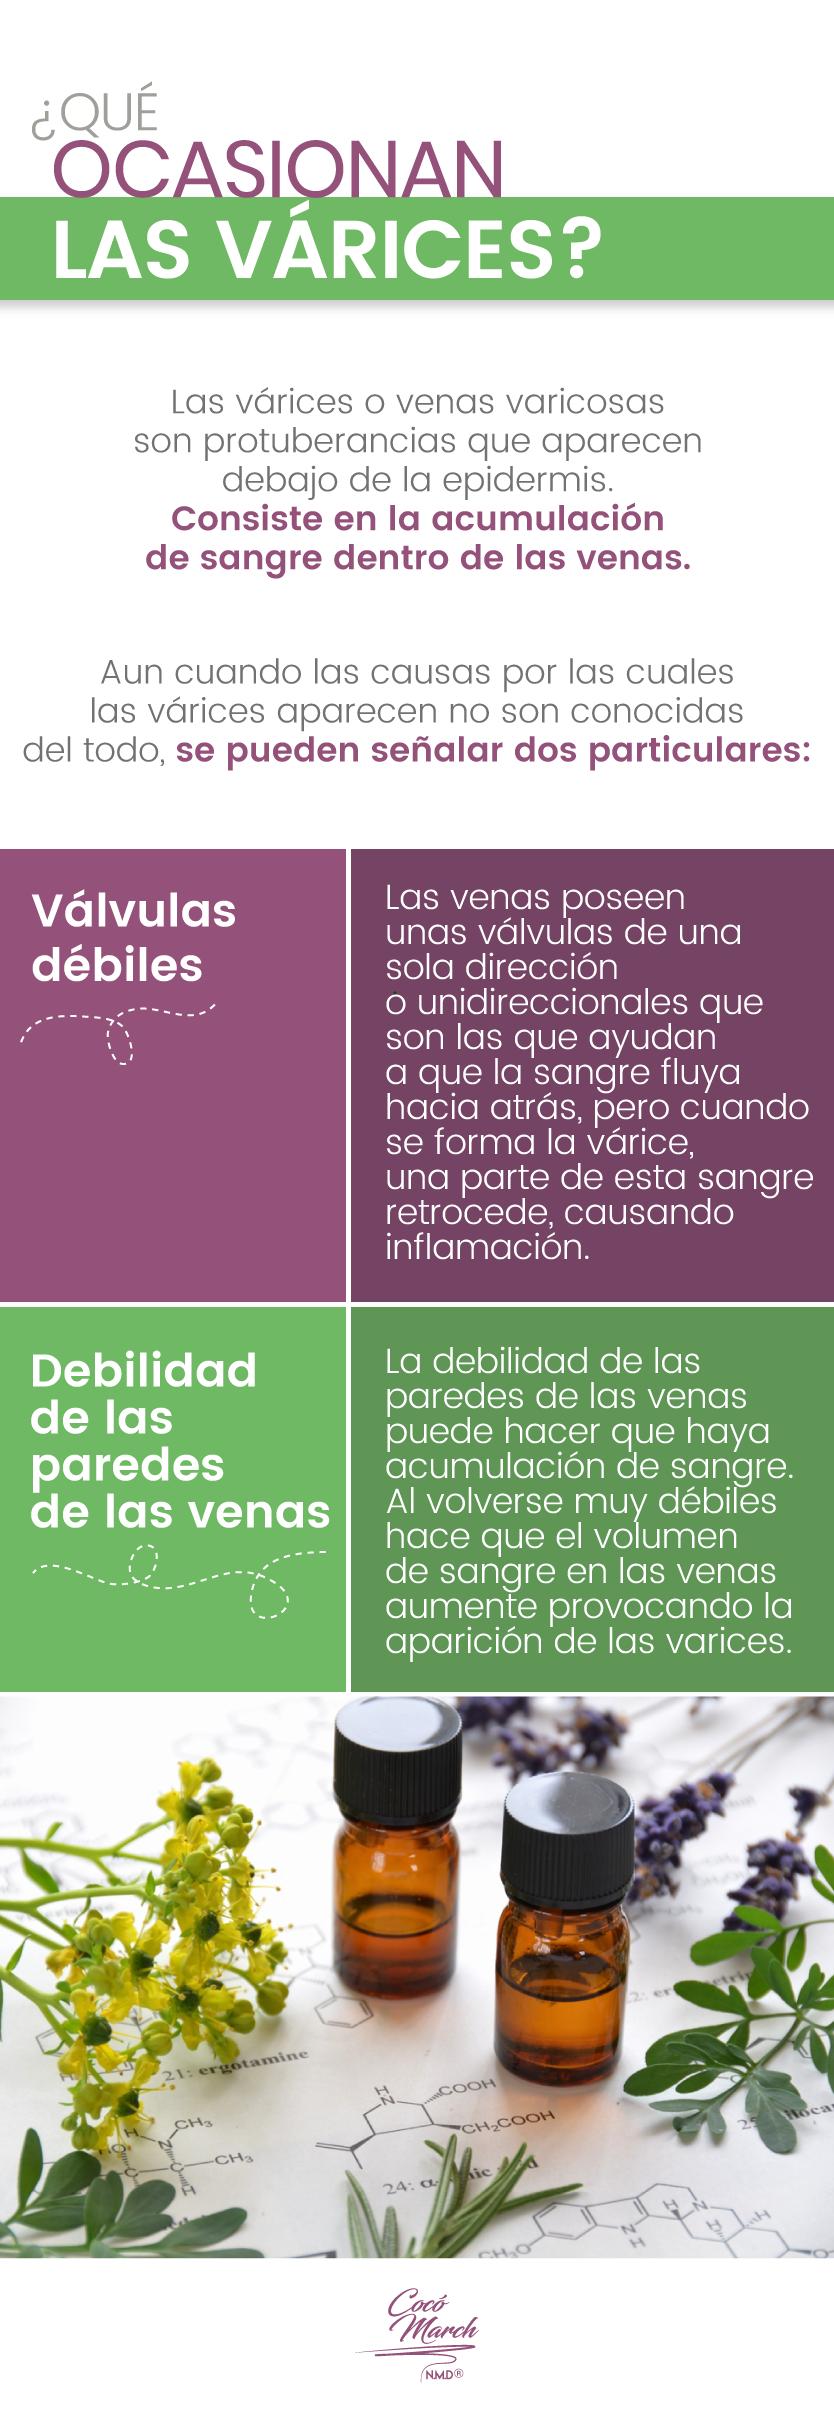 causas-de-las-varices